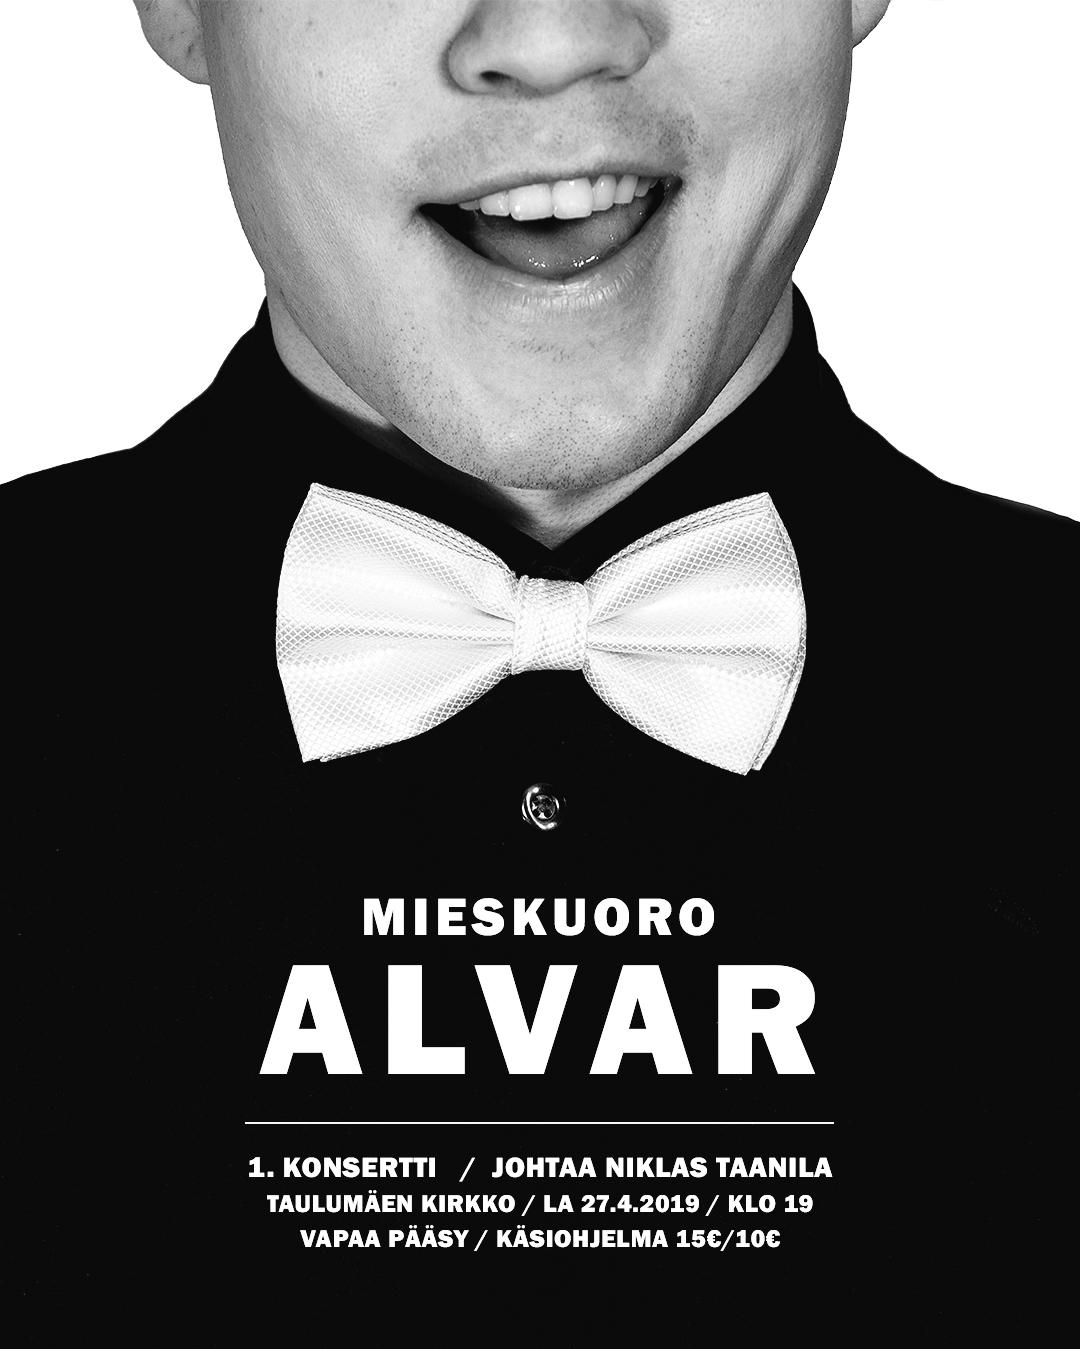 2019 04 10 Mieskuoro Alvari juliste, 1.konsertti, Instagram